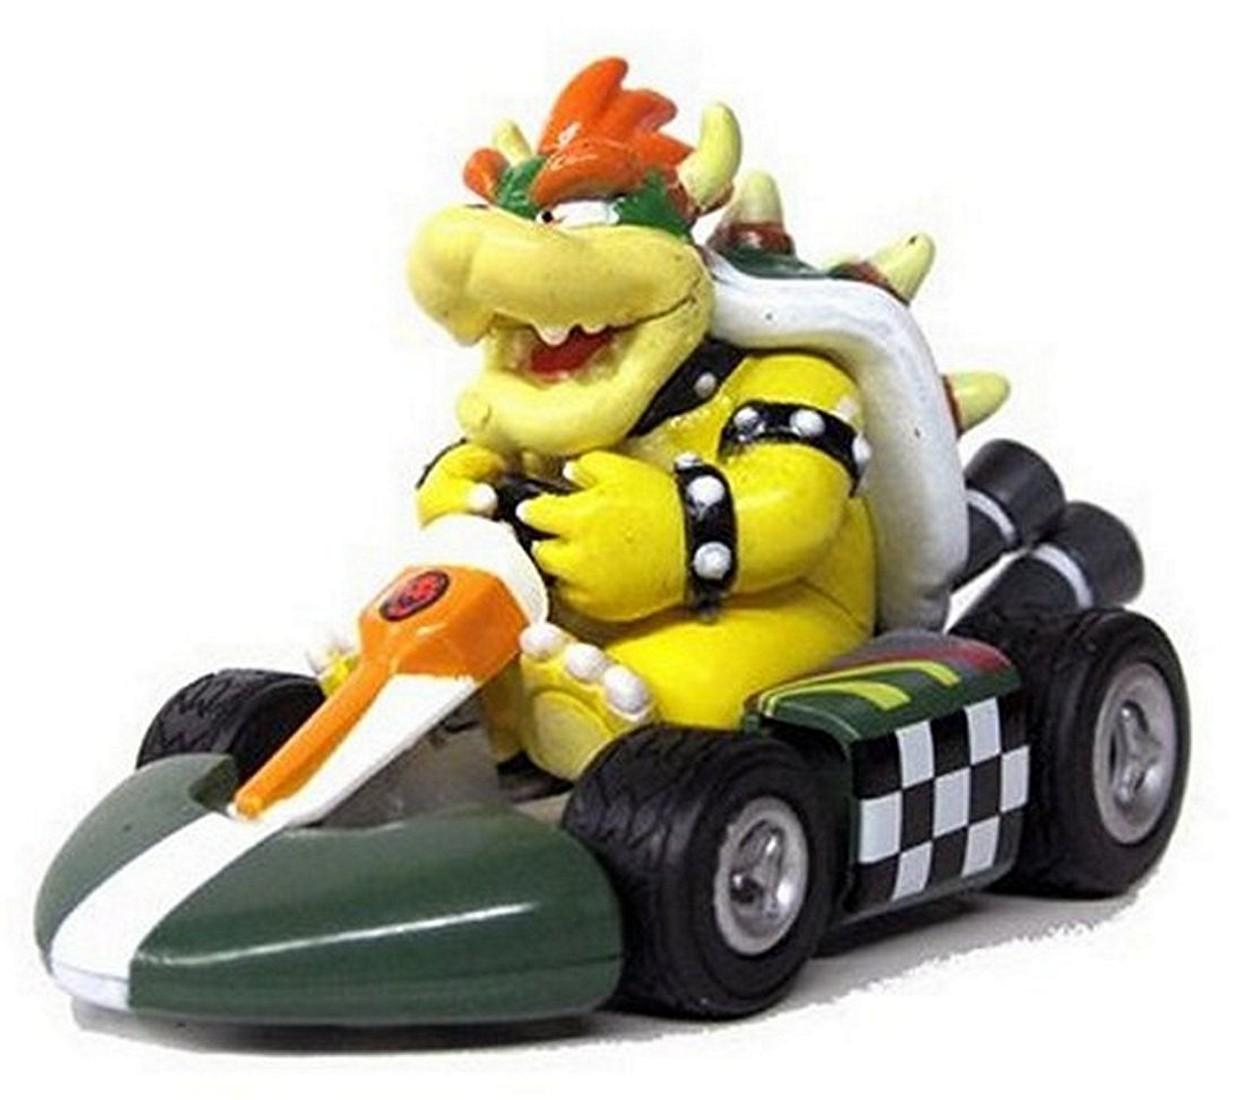 Nintendo mario kart wii pull back car version 2 mini for Coupe miroir mario kart wii